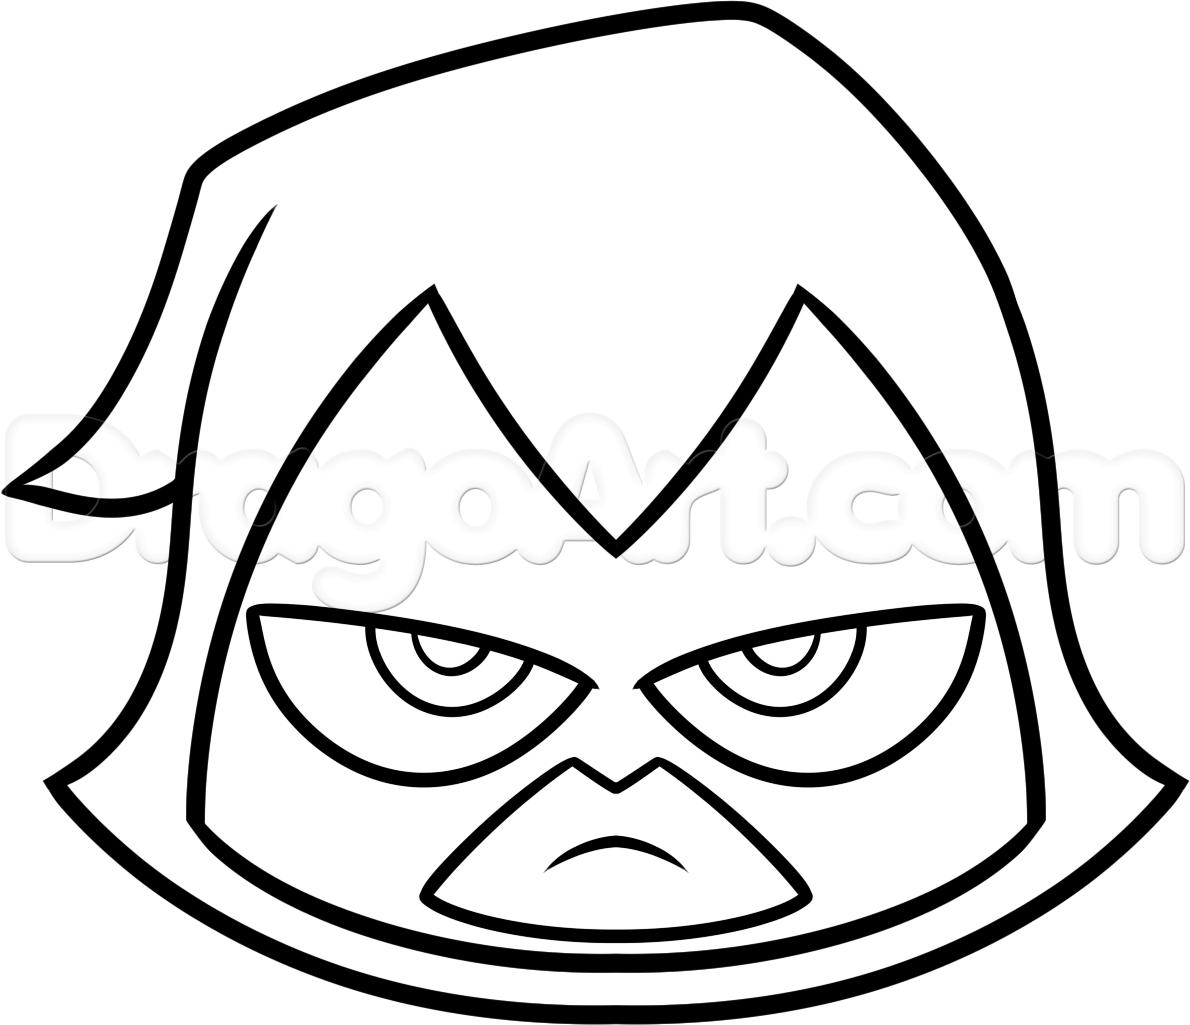 1190x1025 Cartoon Characters To Draw Easy How To Draw Cute Cartoon